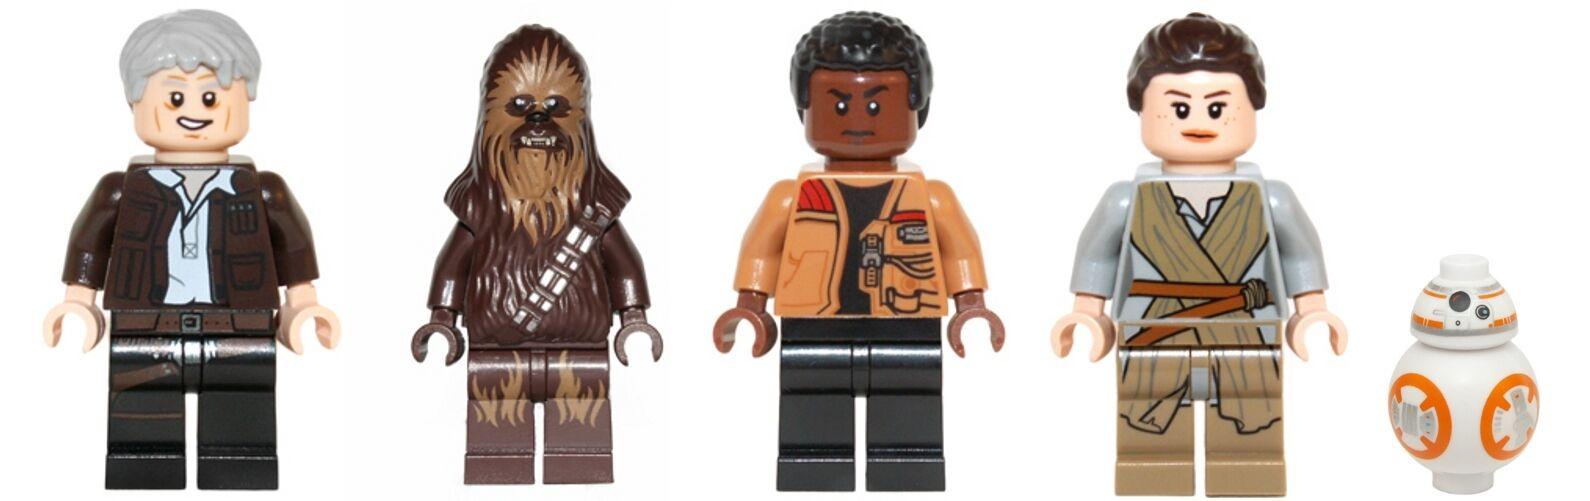 Lego 75105 Star Wars-Han Solo, Chewbacca, Finn, Rey & BB8-Mini Figuras